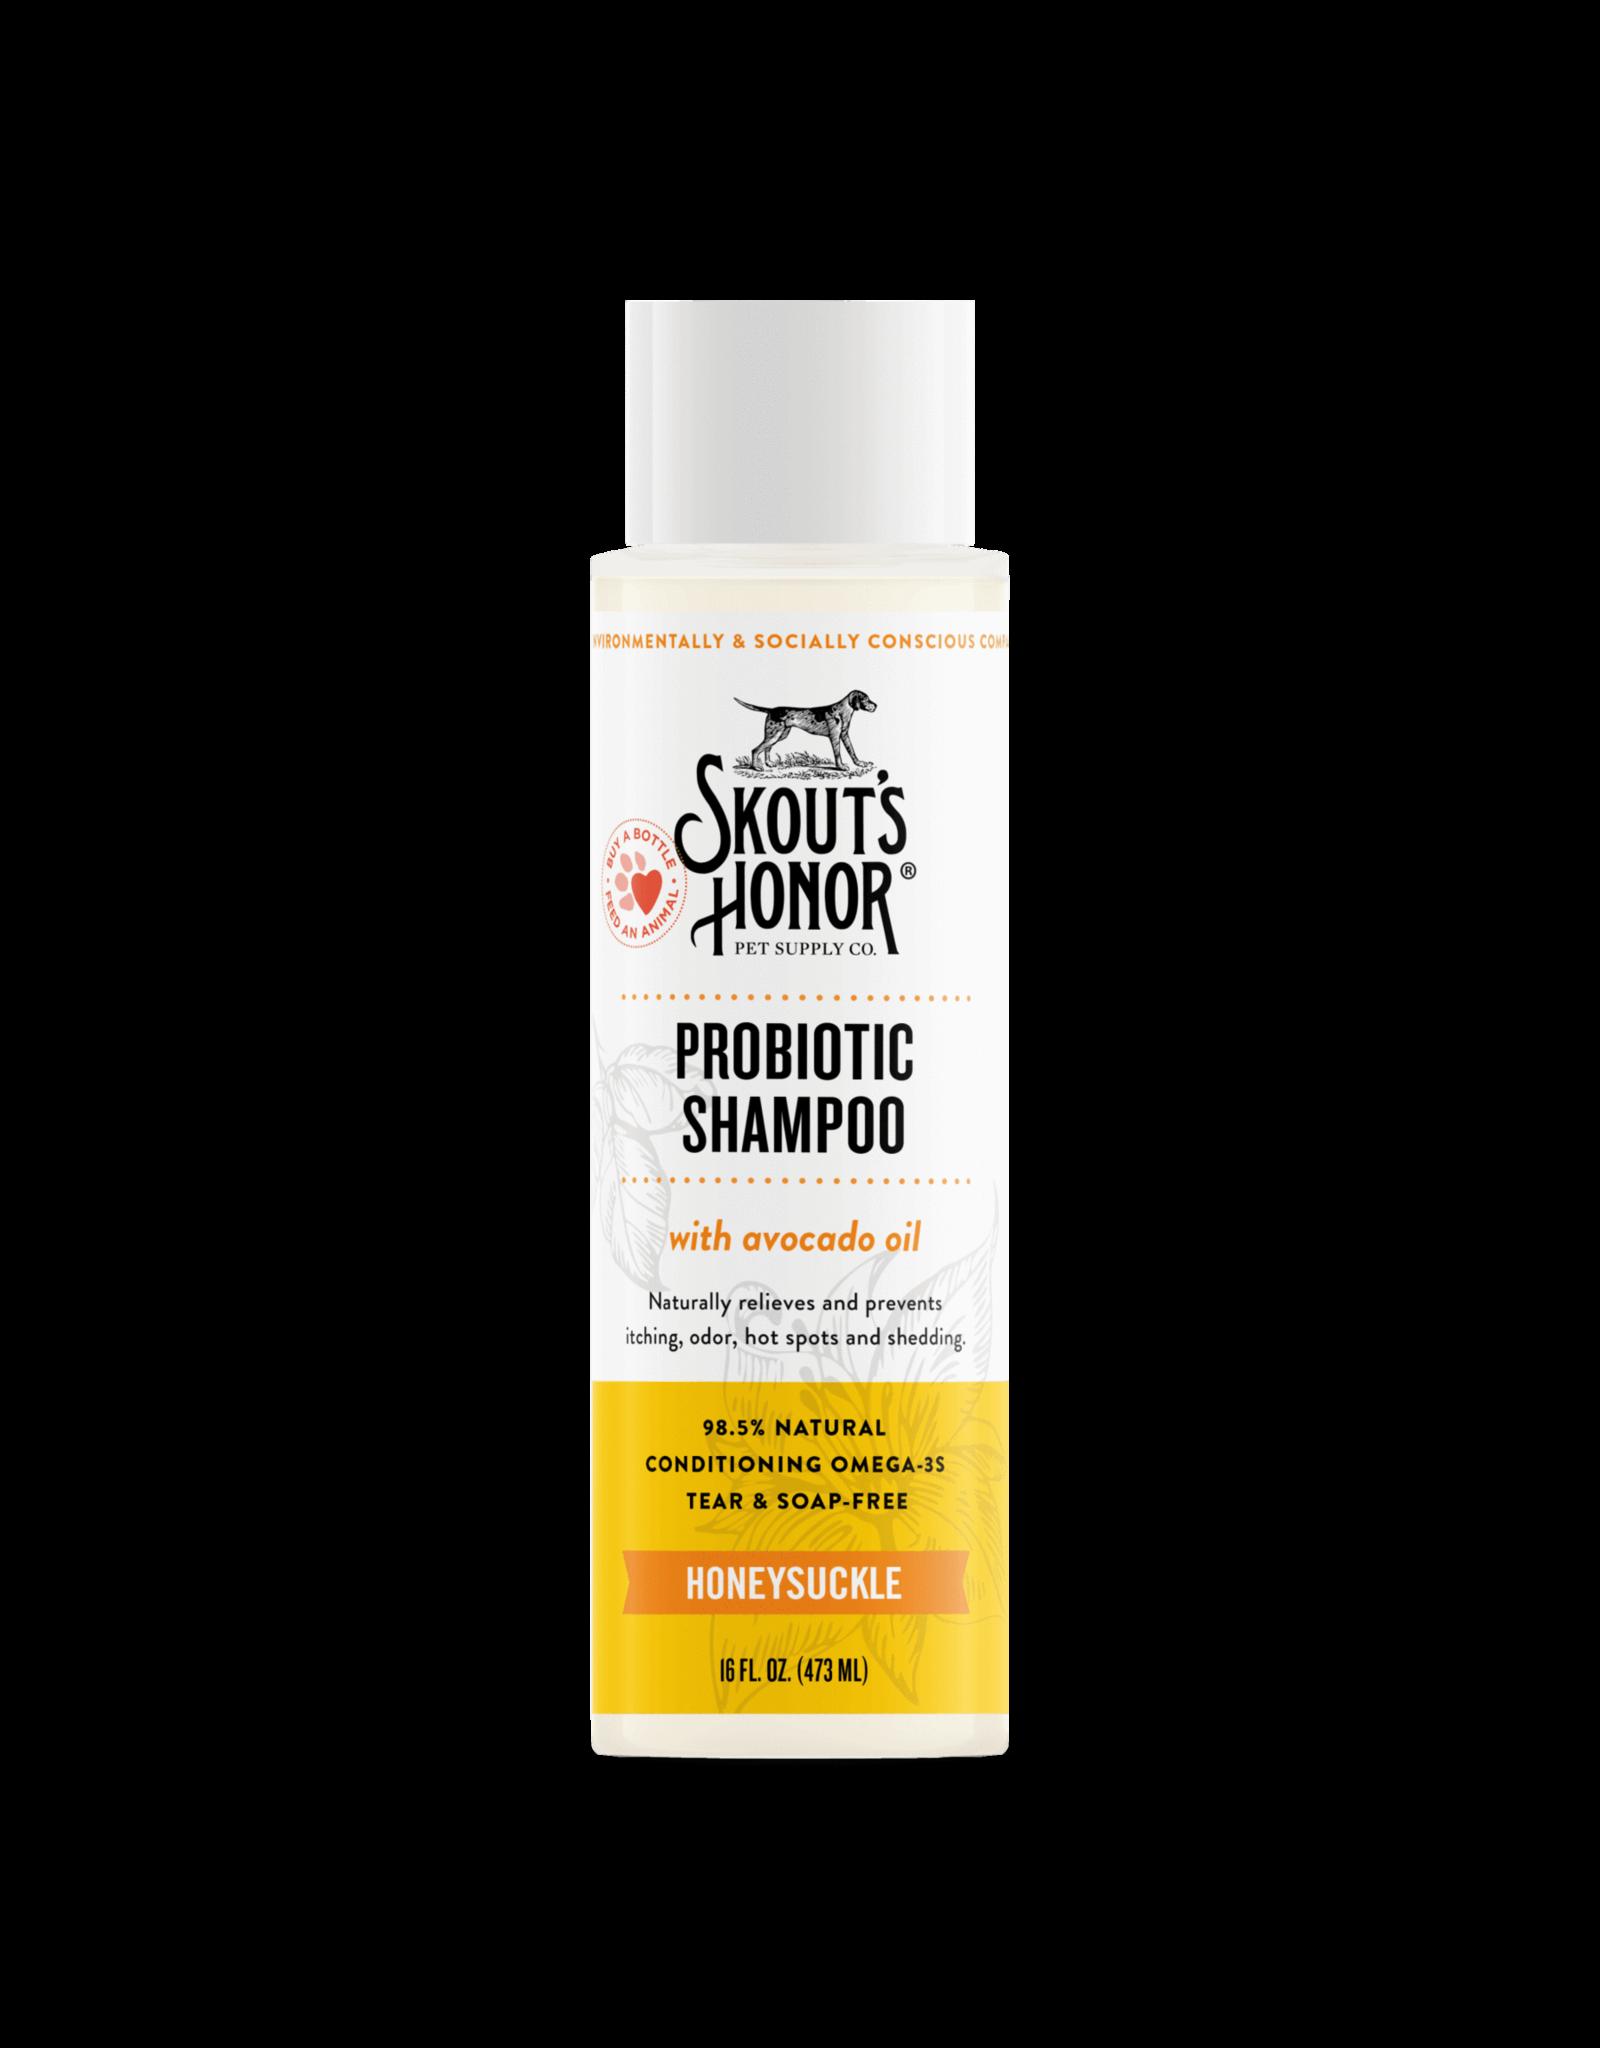 Skout's Honor Probiotic Shampoo